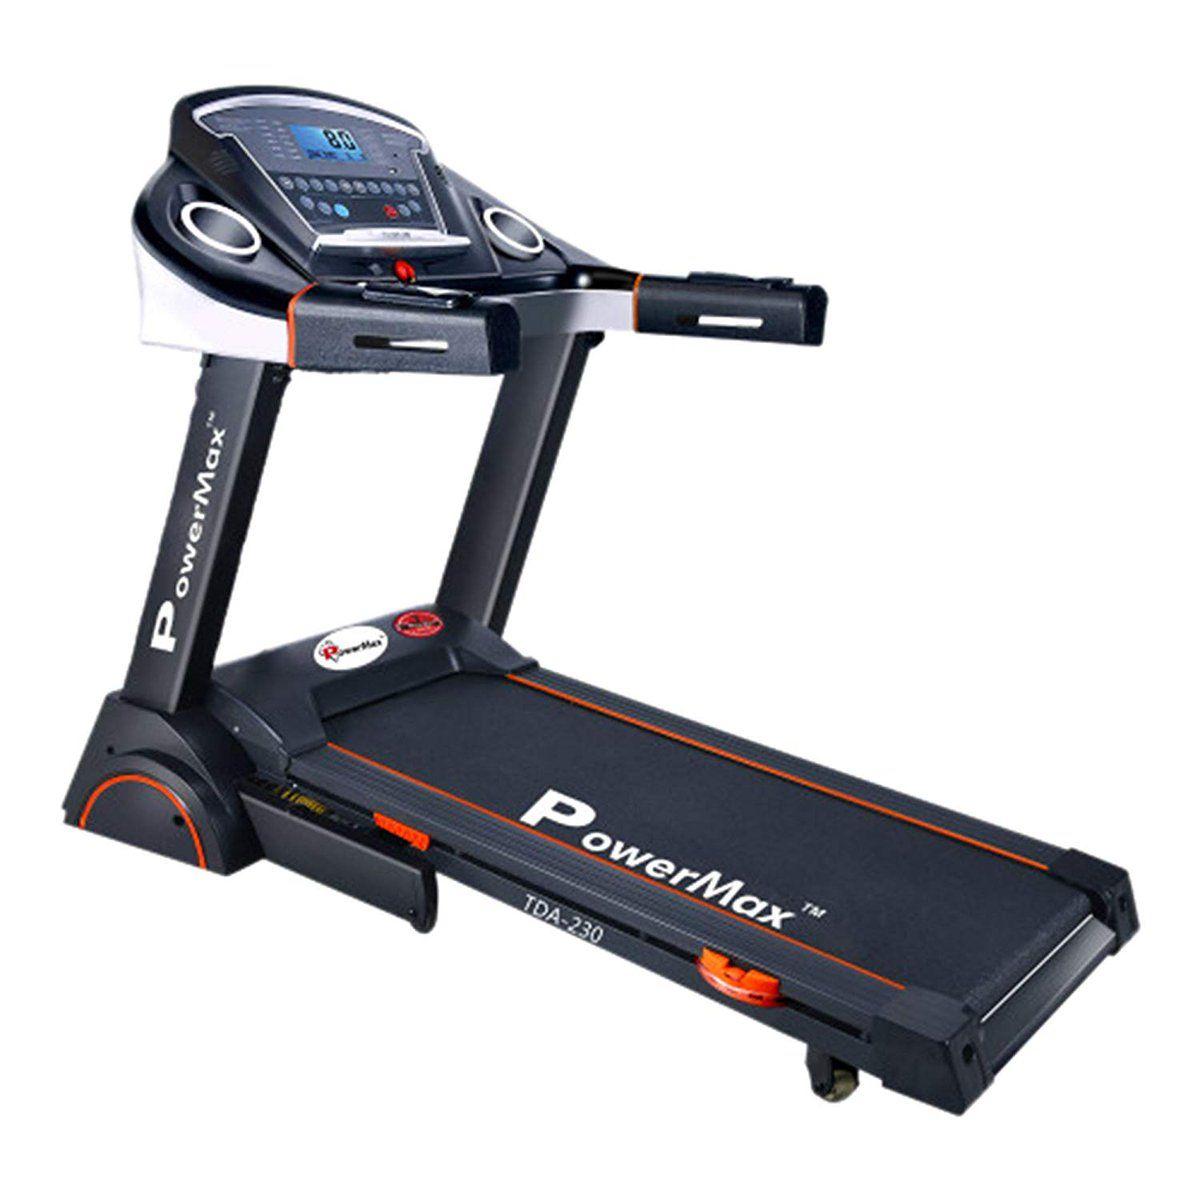 Https Twitter Com Futureuci Good Treadmills Treadmill Home